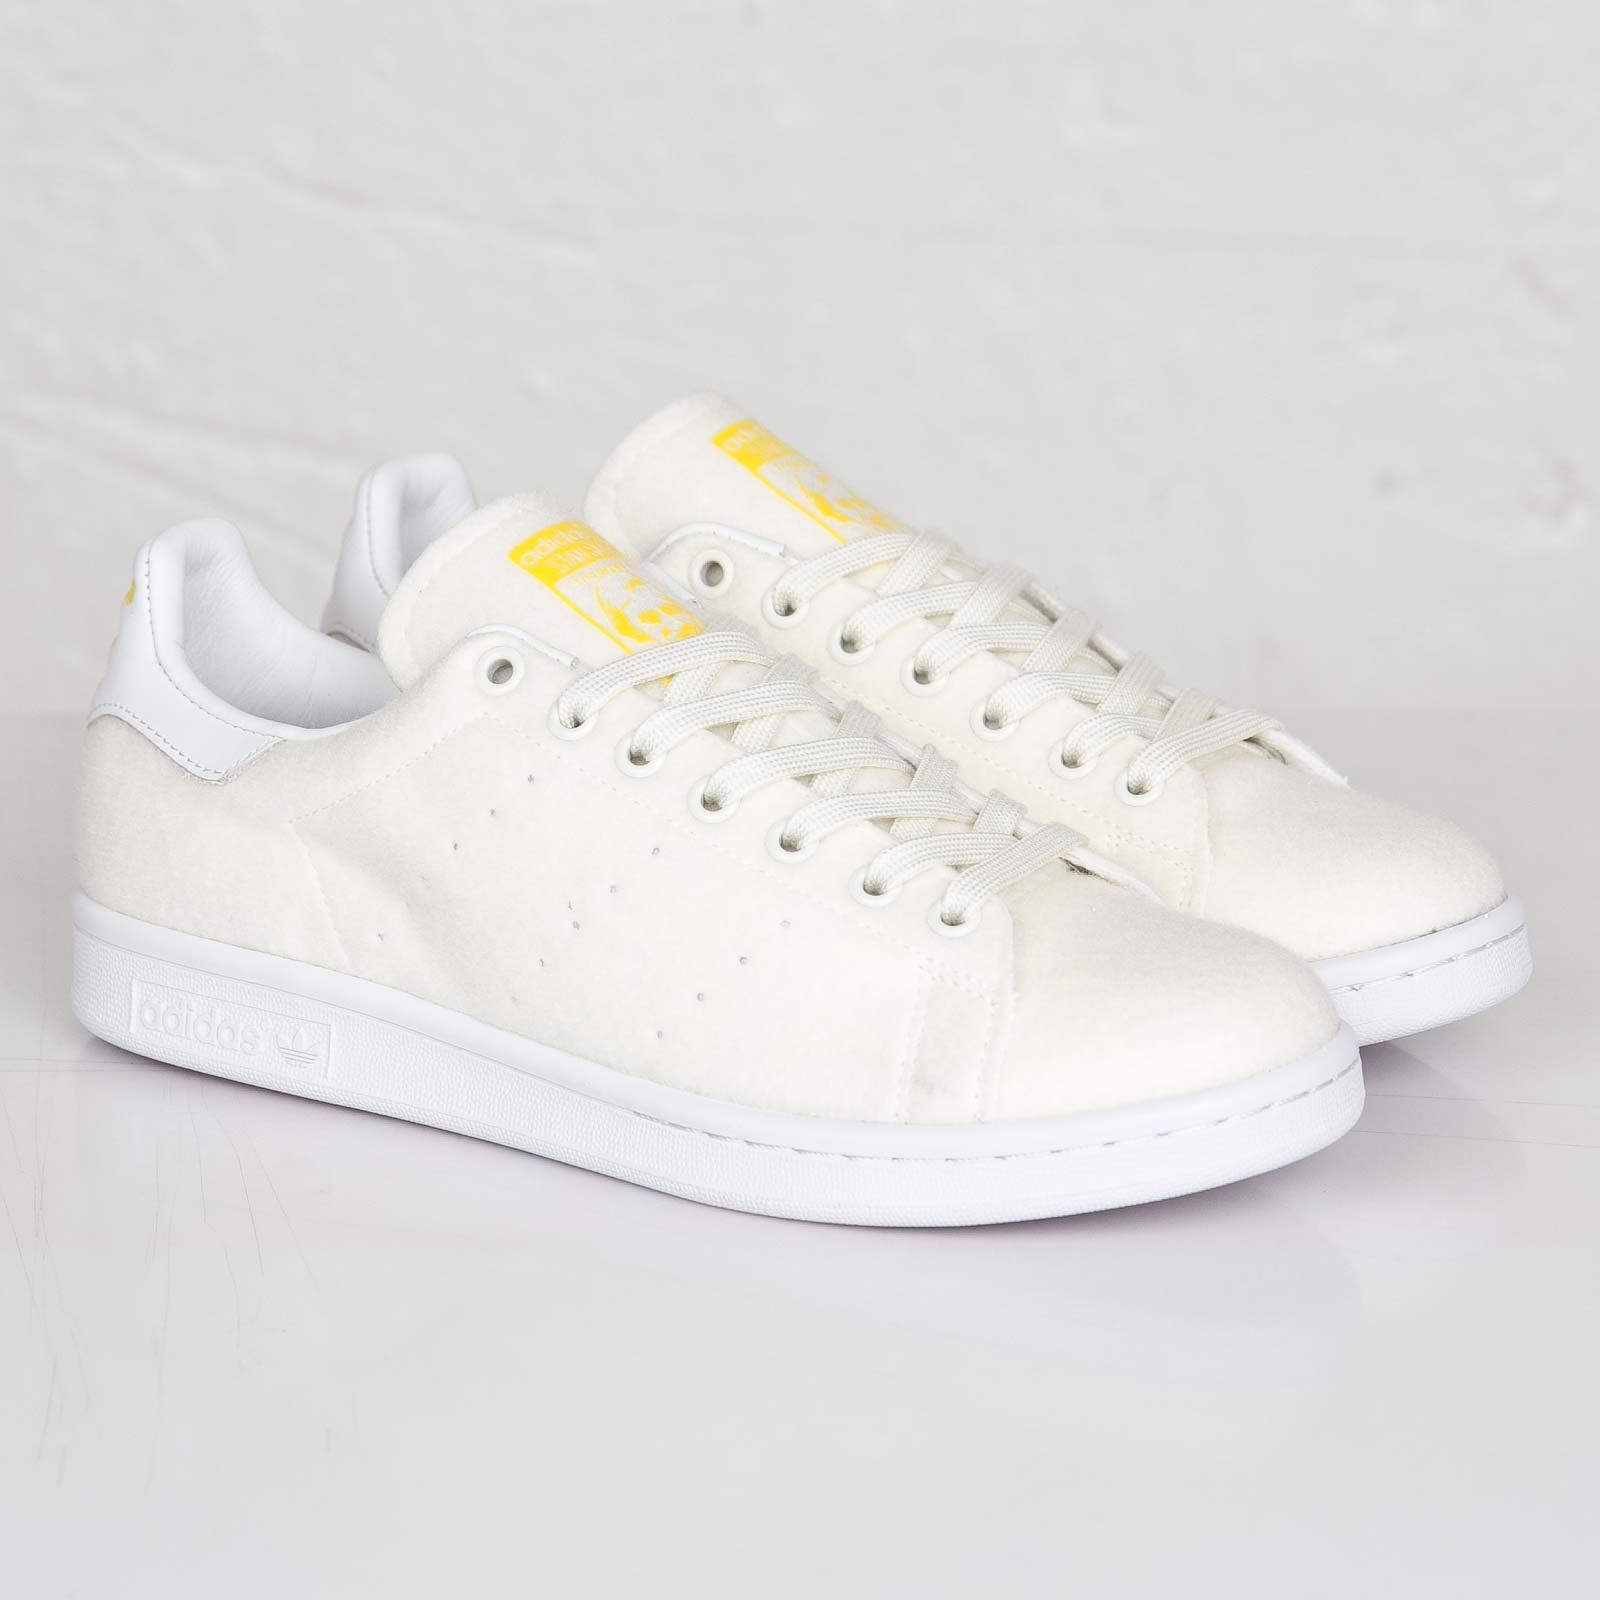 best sneakers 91b4a 69e91 adidas PW Stan Smith TNS - B25390 - Sneakersnstuff ...